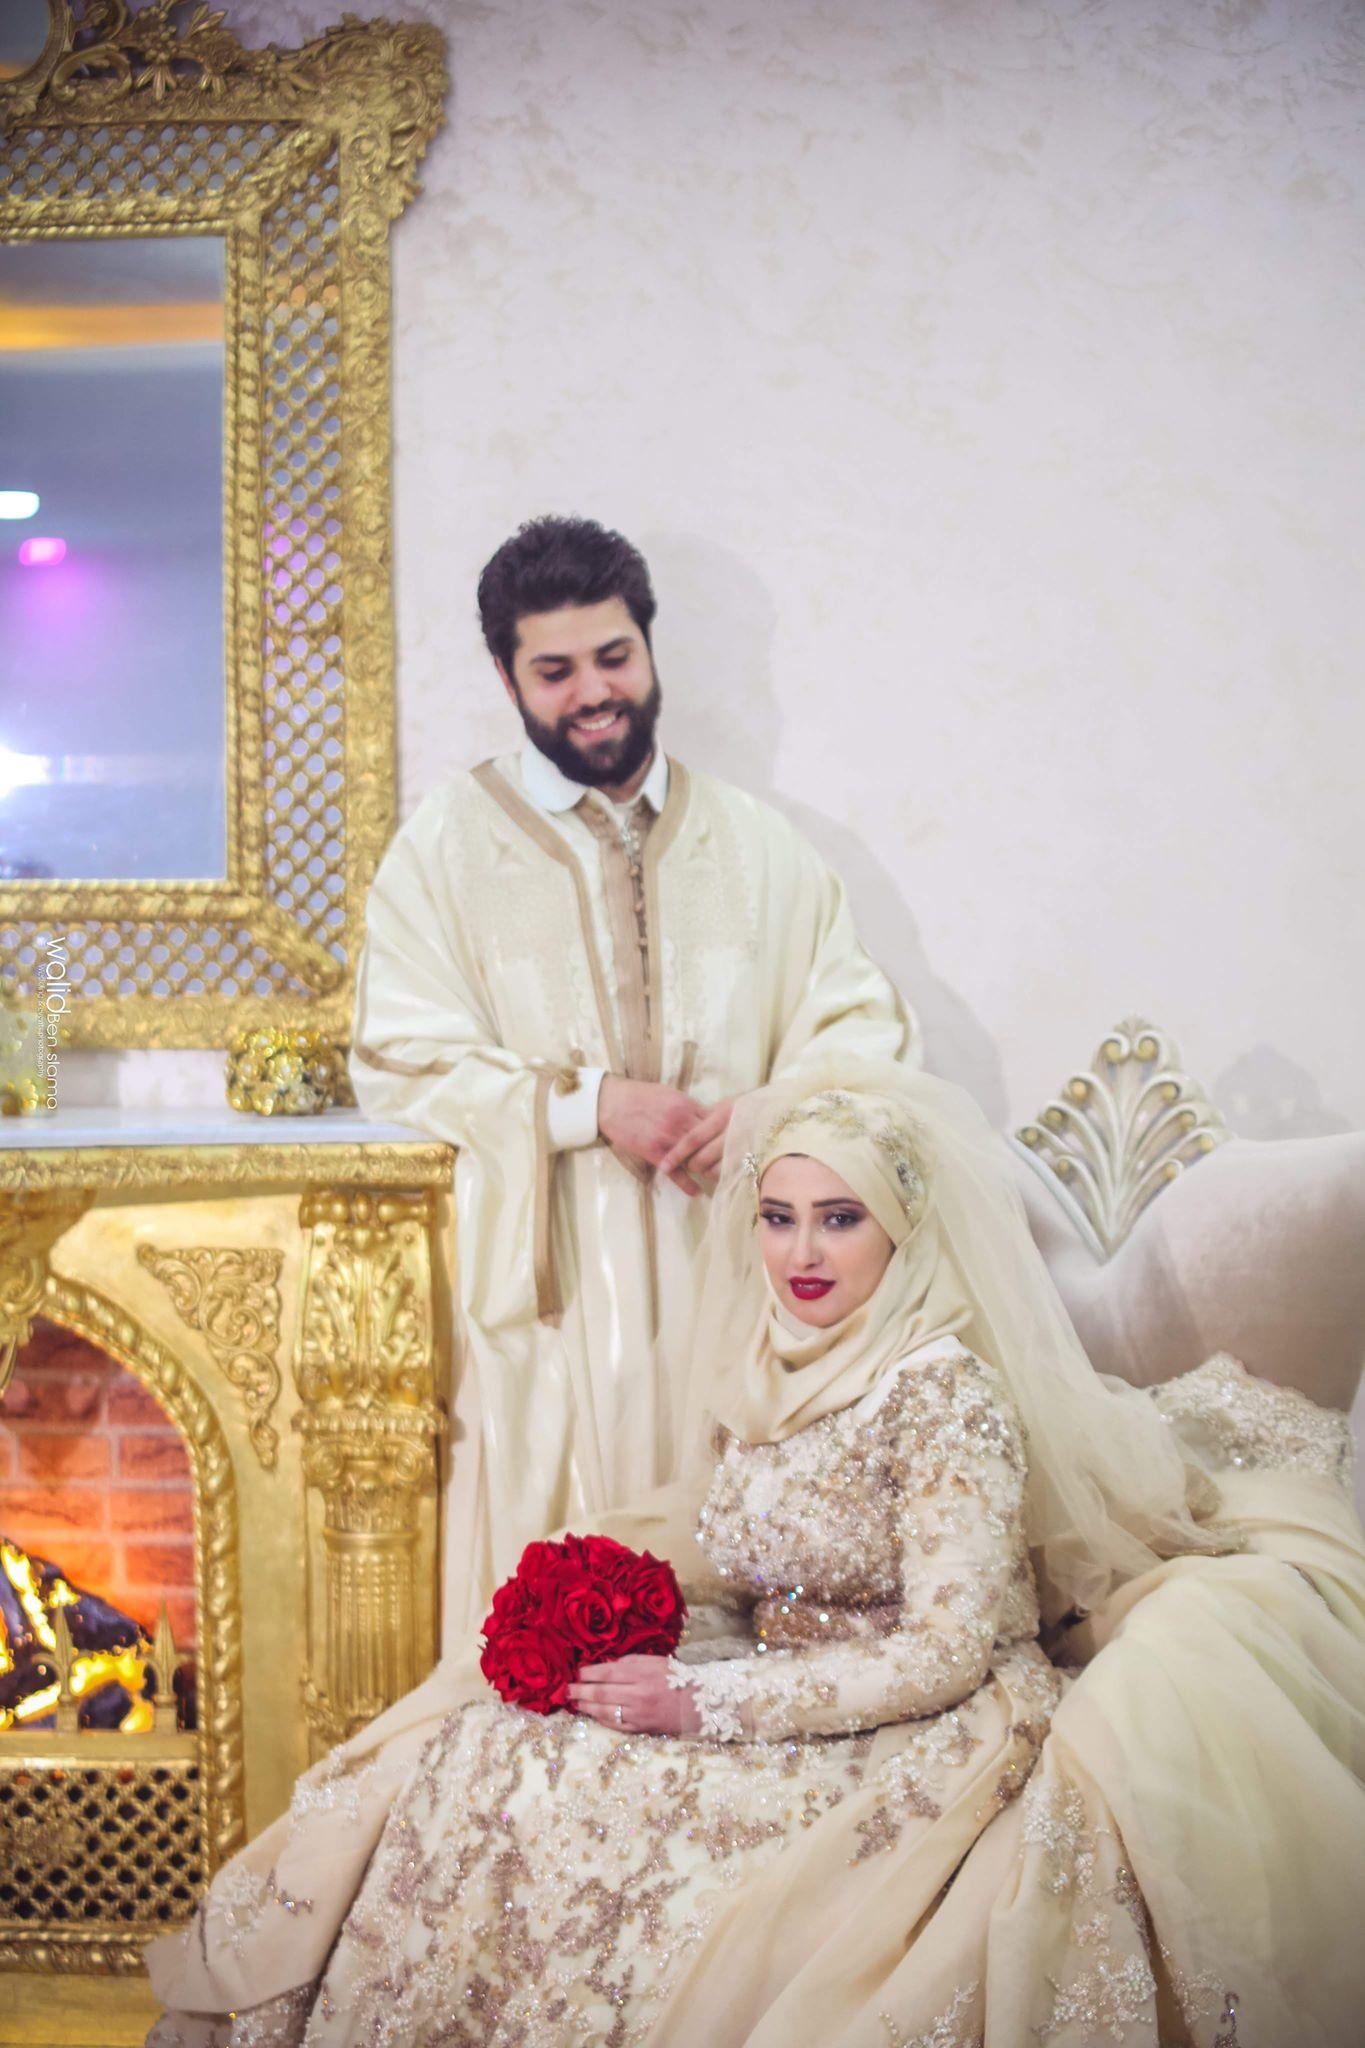 Tesnim_M5_plus_belles_mariées_tunisiennes2019